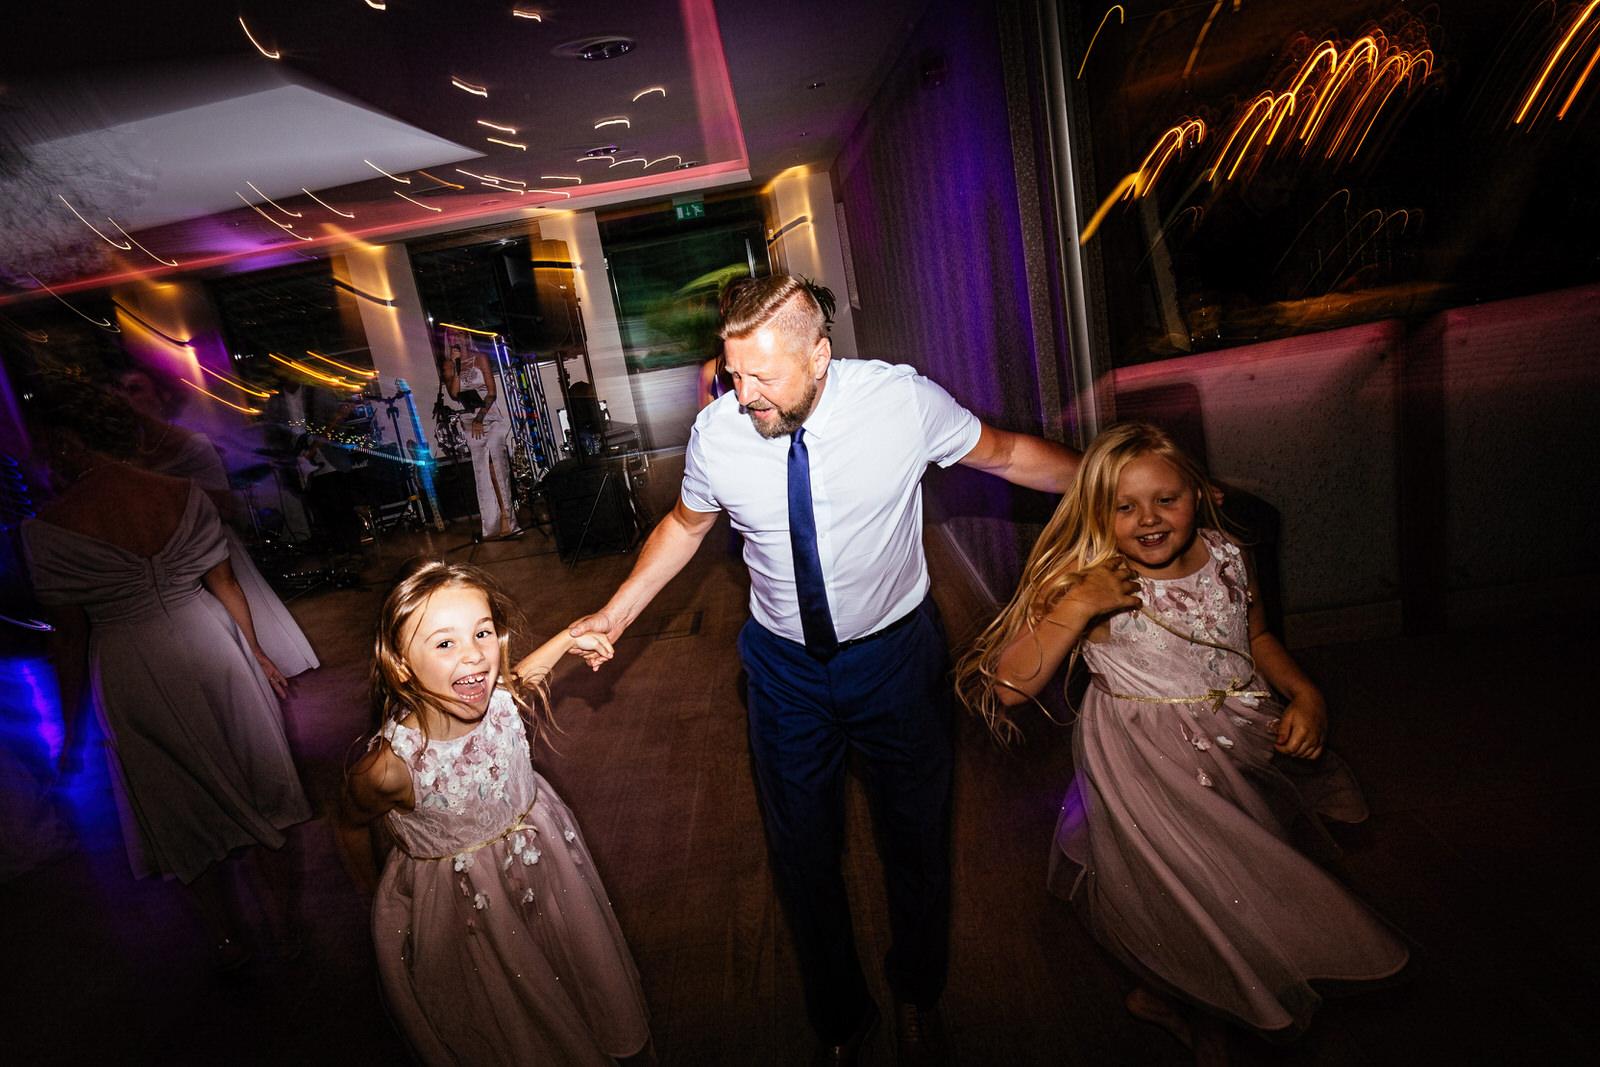 Moddershall-Oaks-Spa-Wedding-Photographer-070.jpg